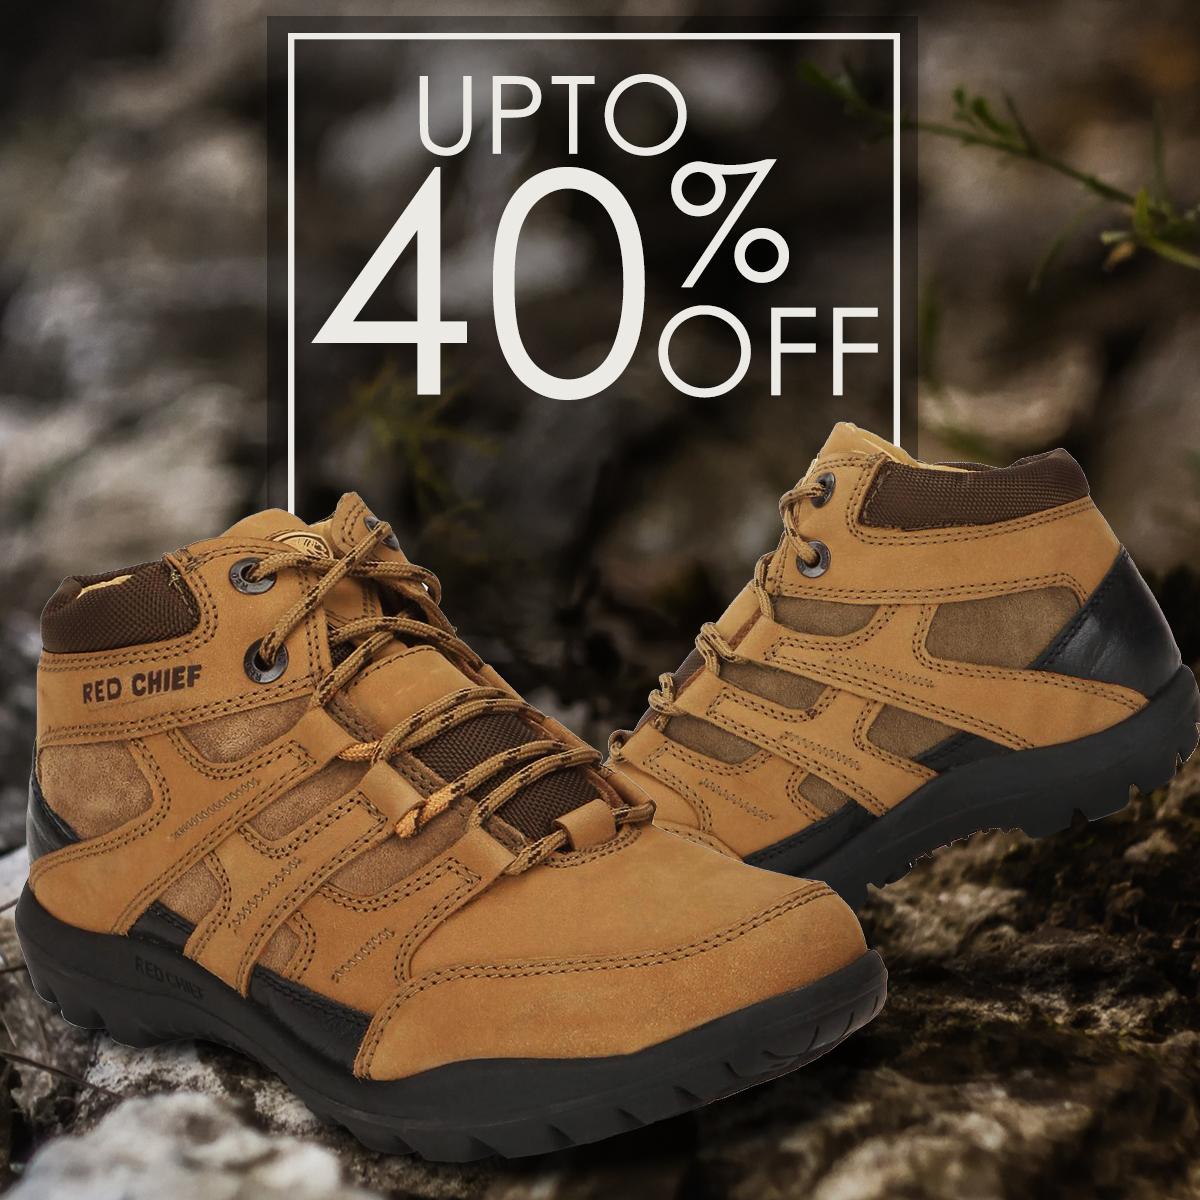 Footwear Discount